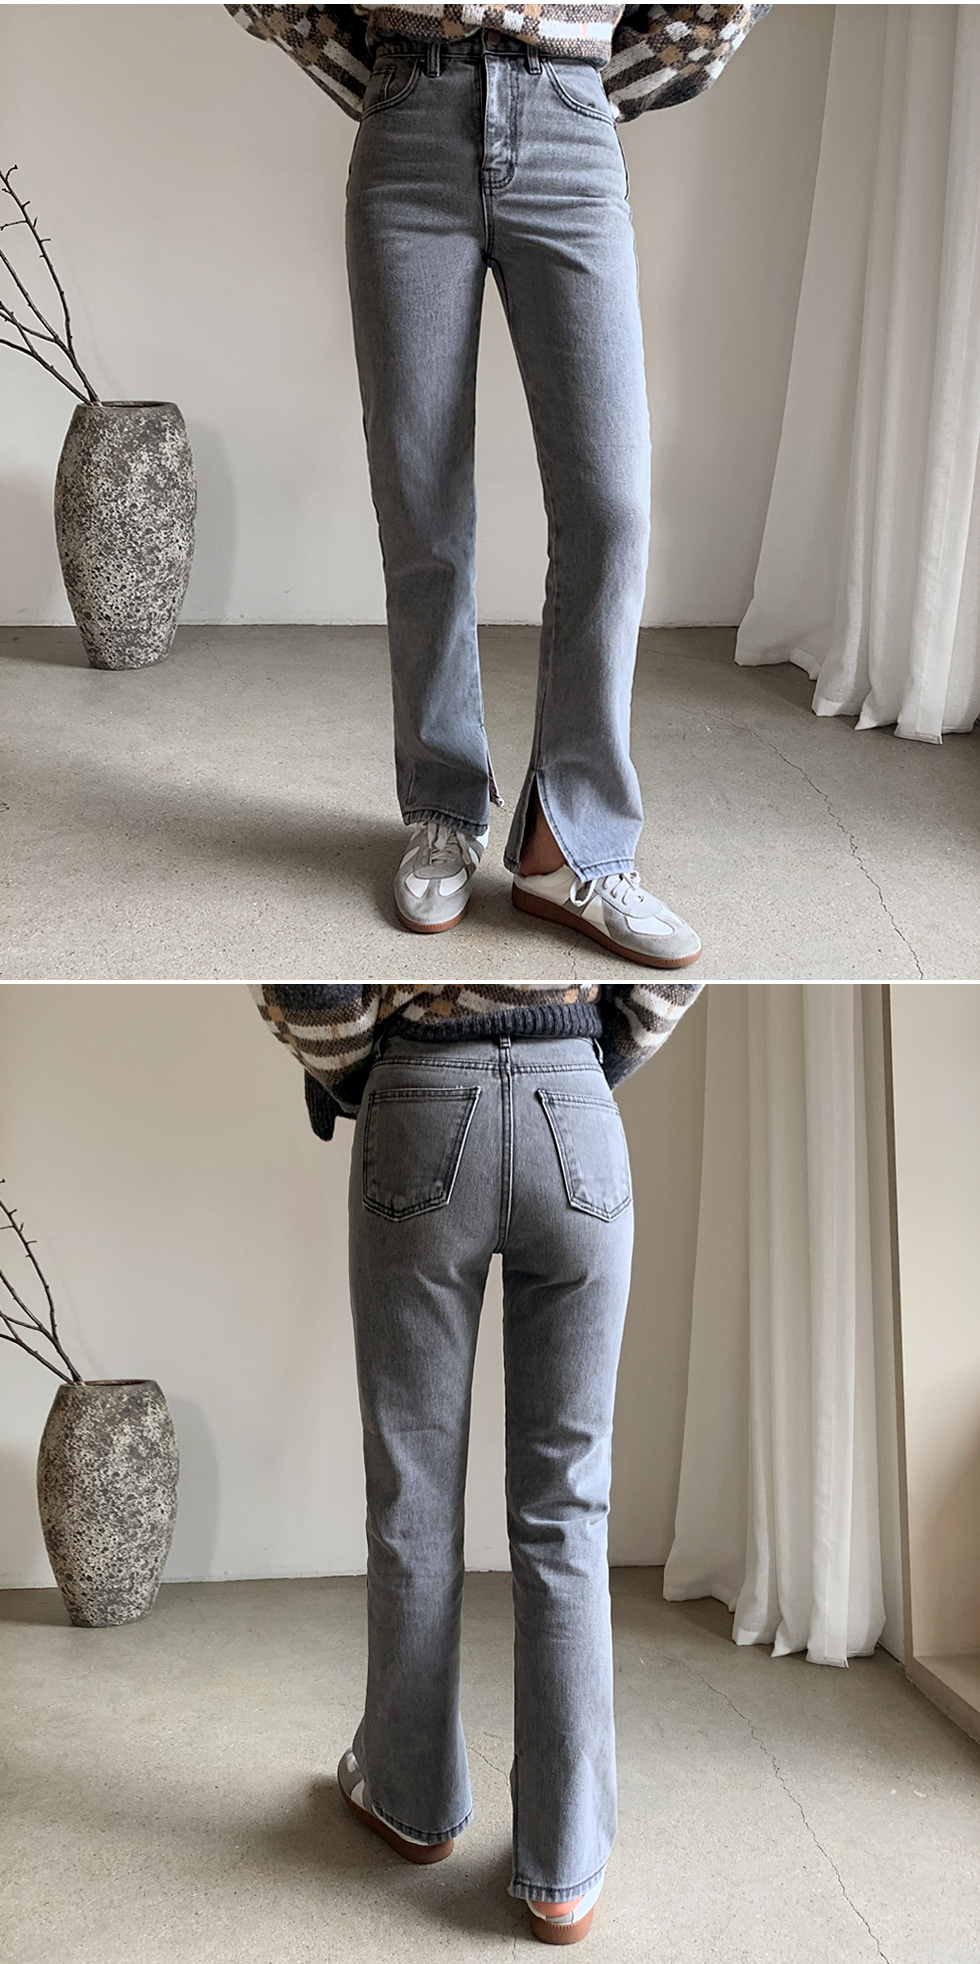 Inslit denim pants